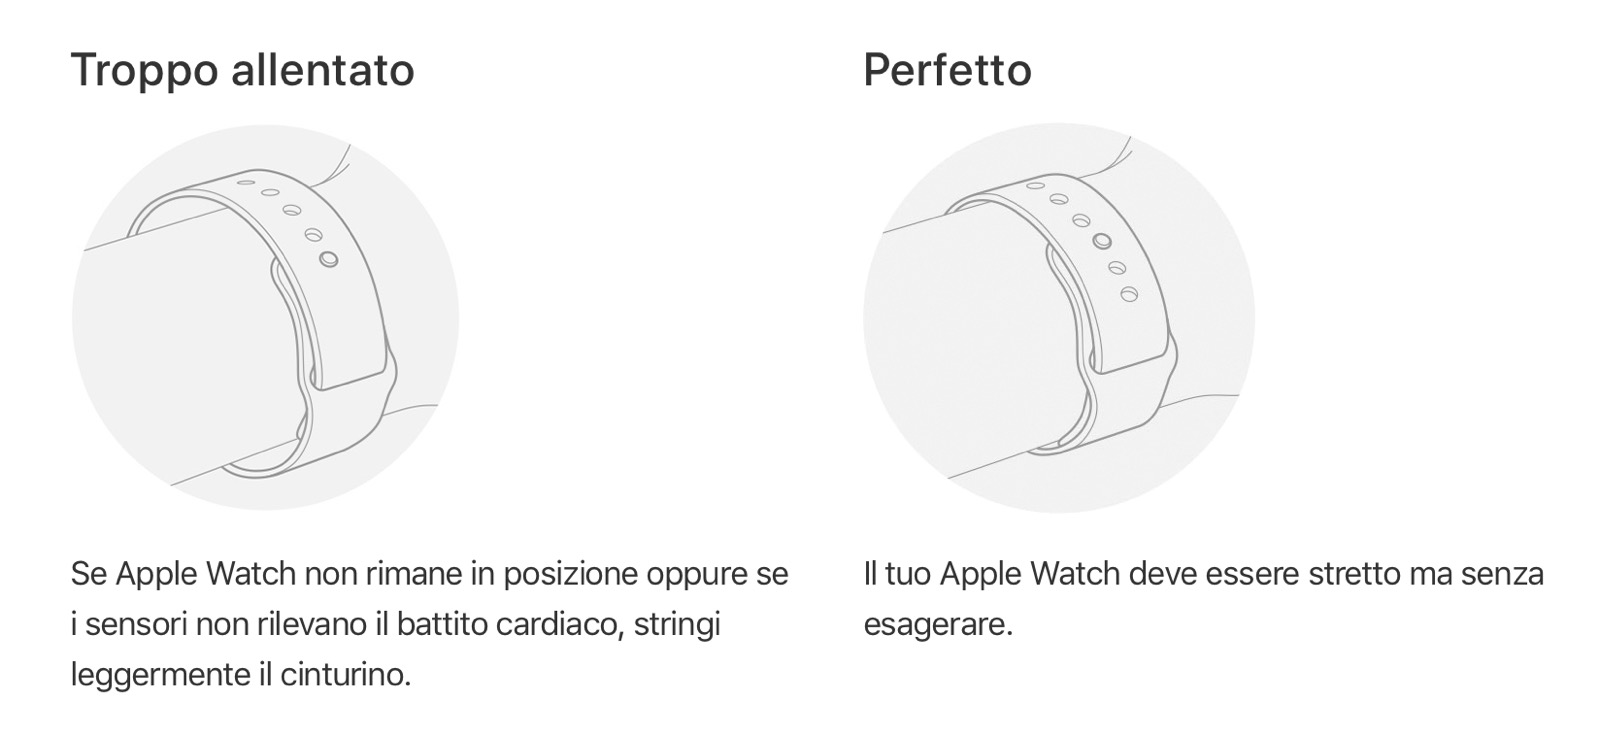 Apple Watch battito cardiaco